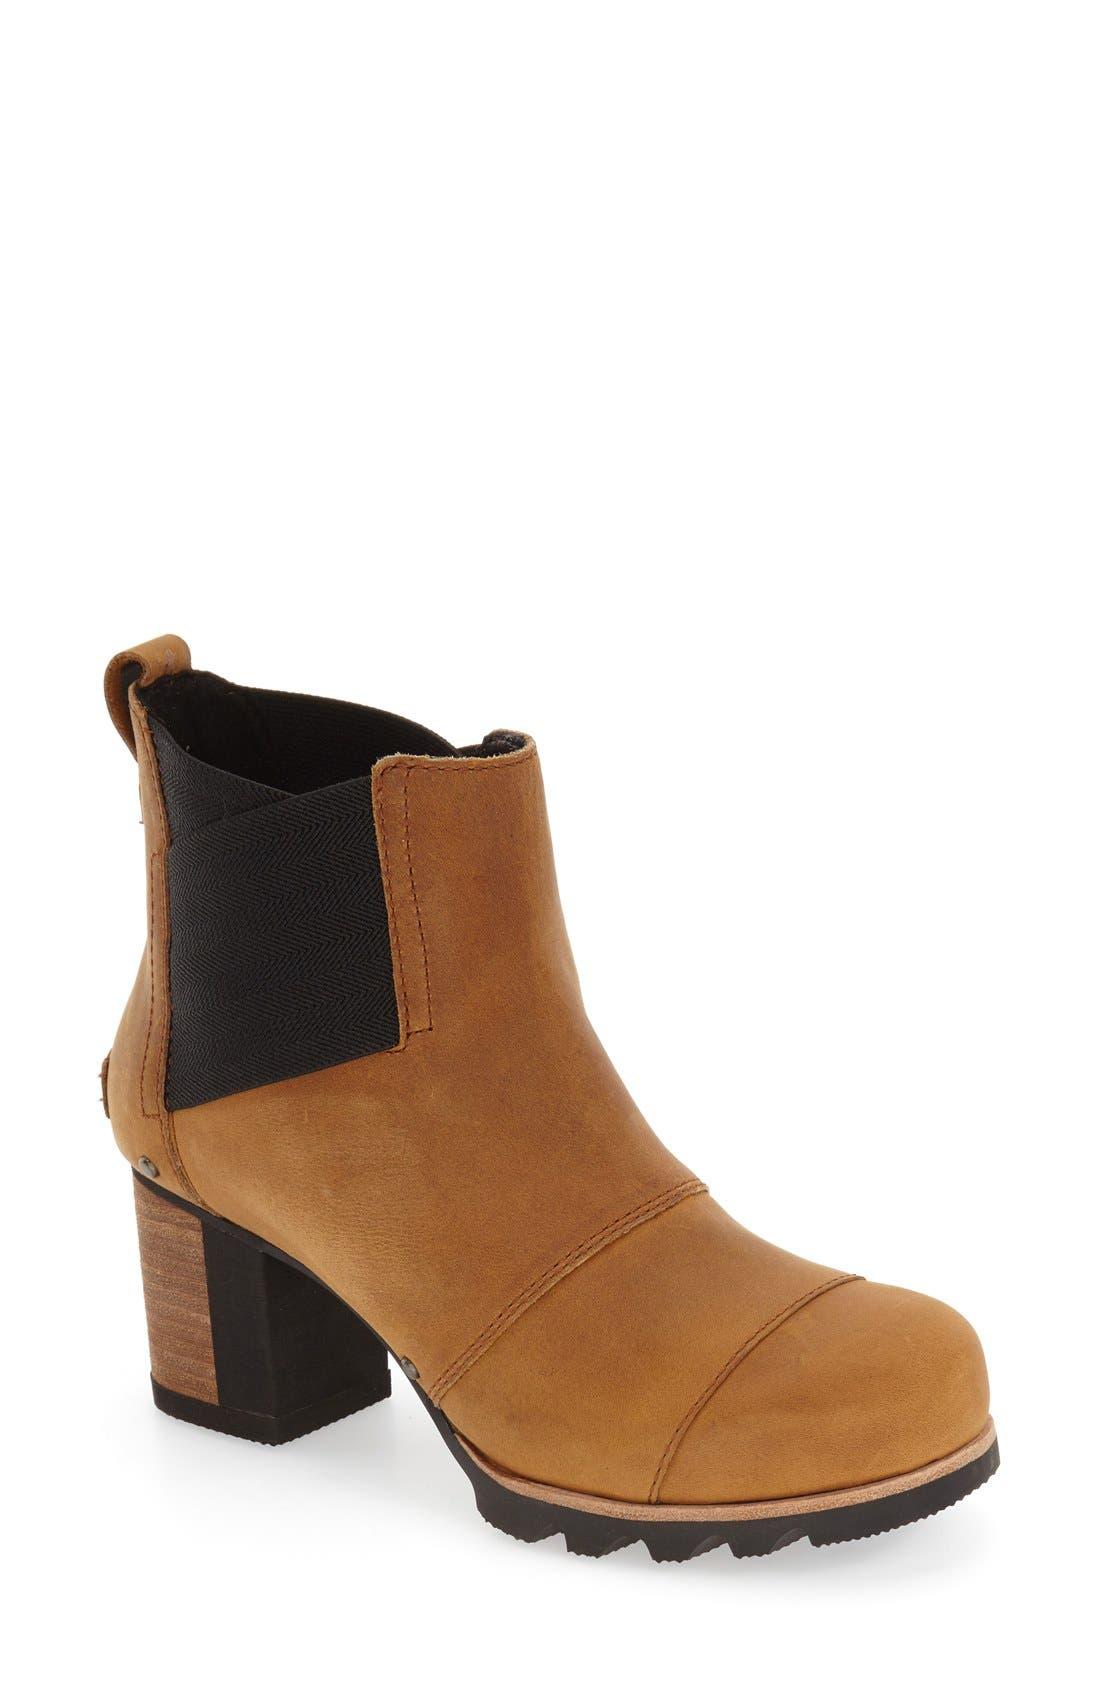 'Addington' Waterproof Chelsea Boot,                             Main thumbnail 1, color,                             Autumn Bronze